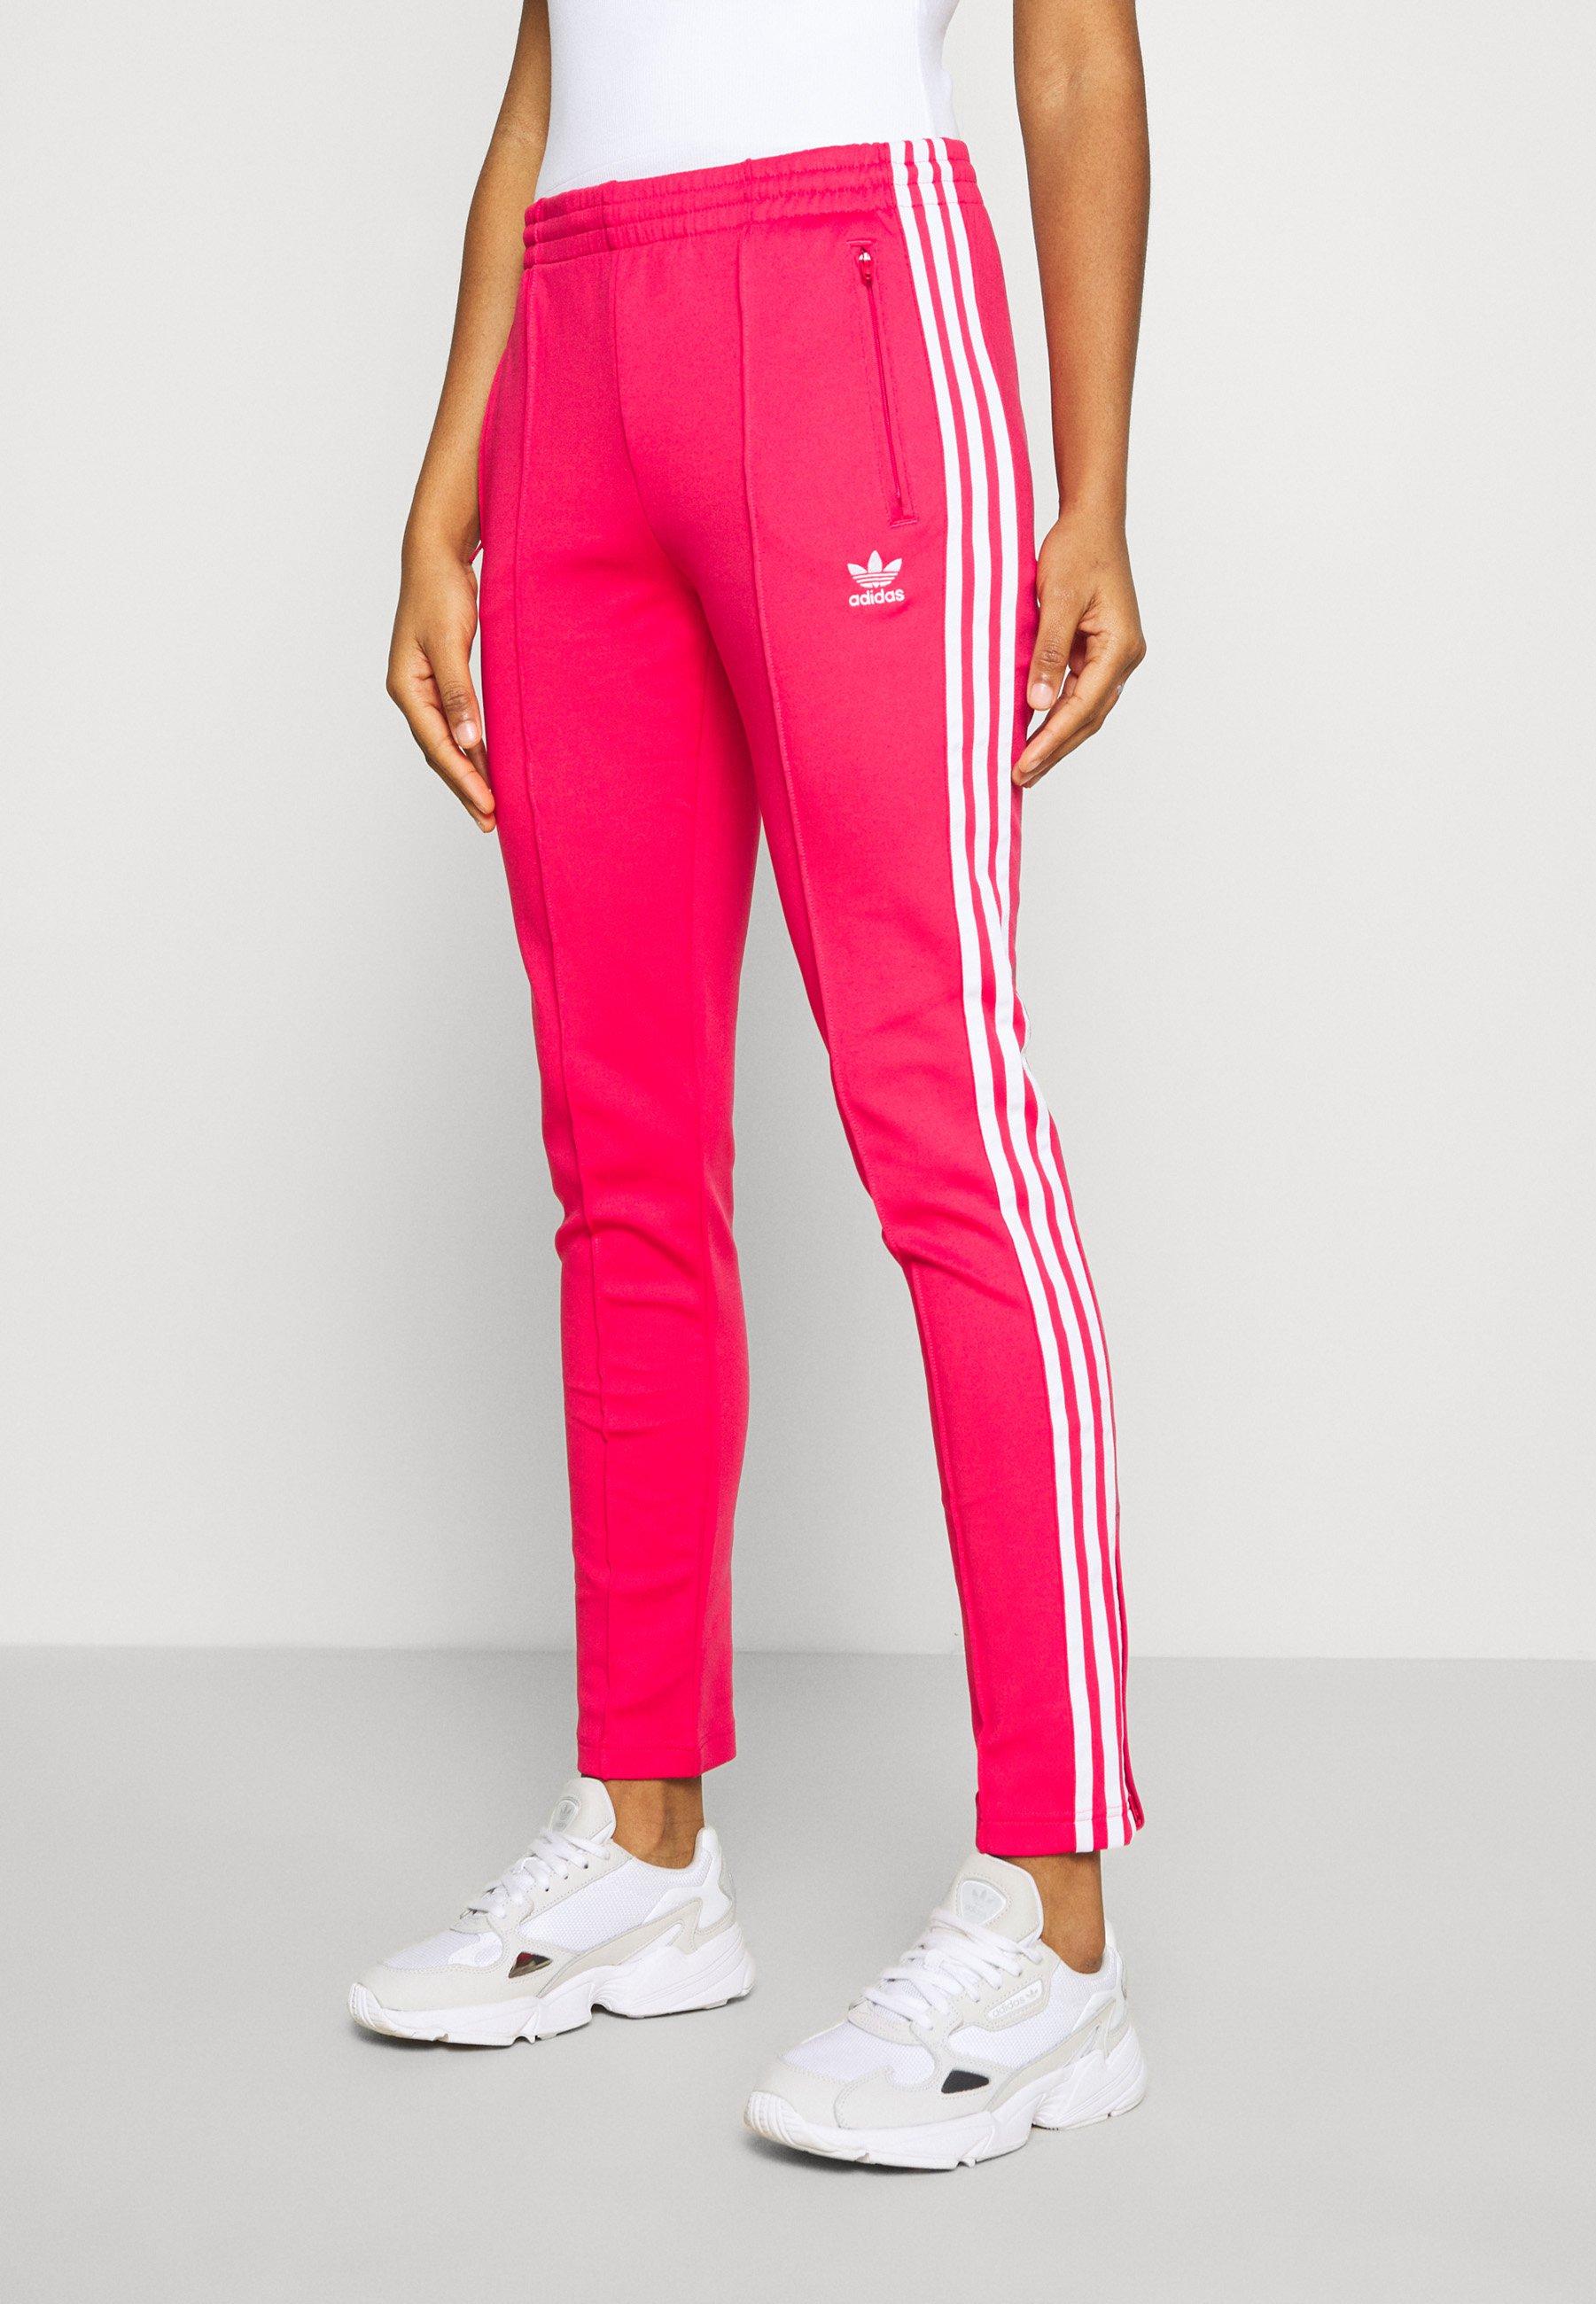 PANTS Jogginghose power pinkwhite